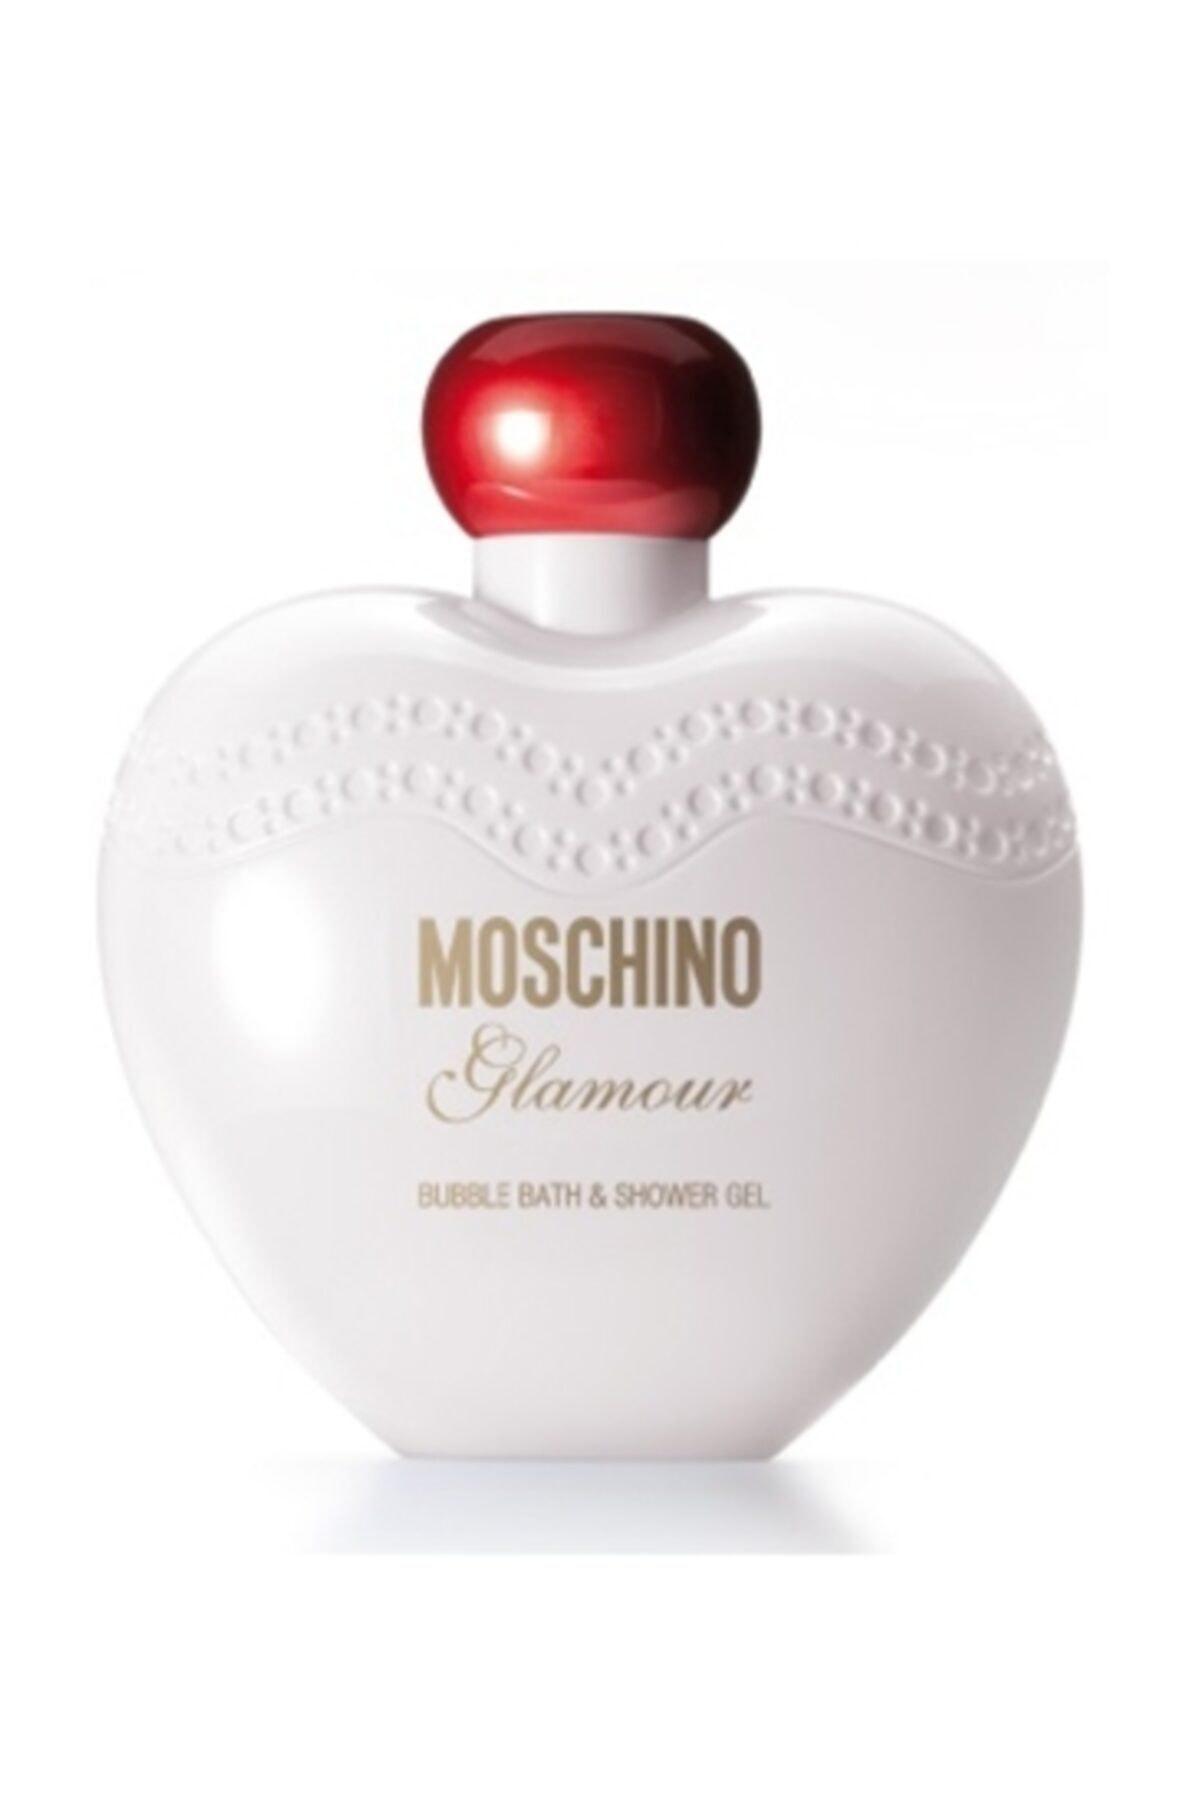 Moschino Glamour Duş Jeli 200 Ml 1